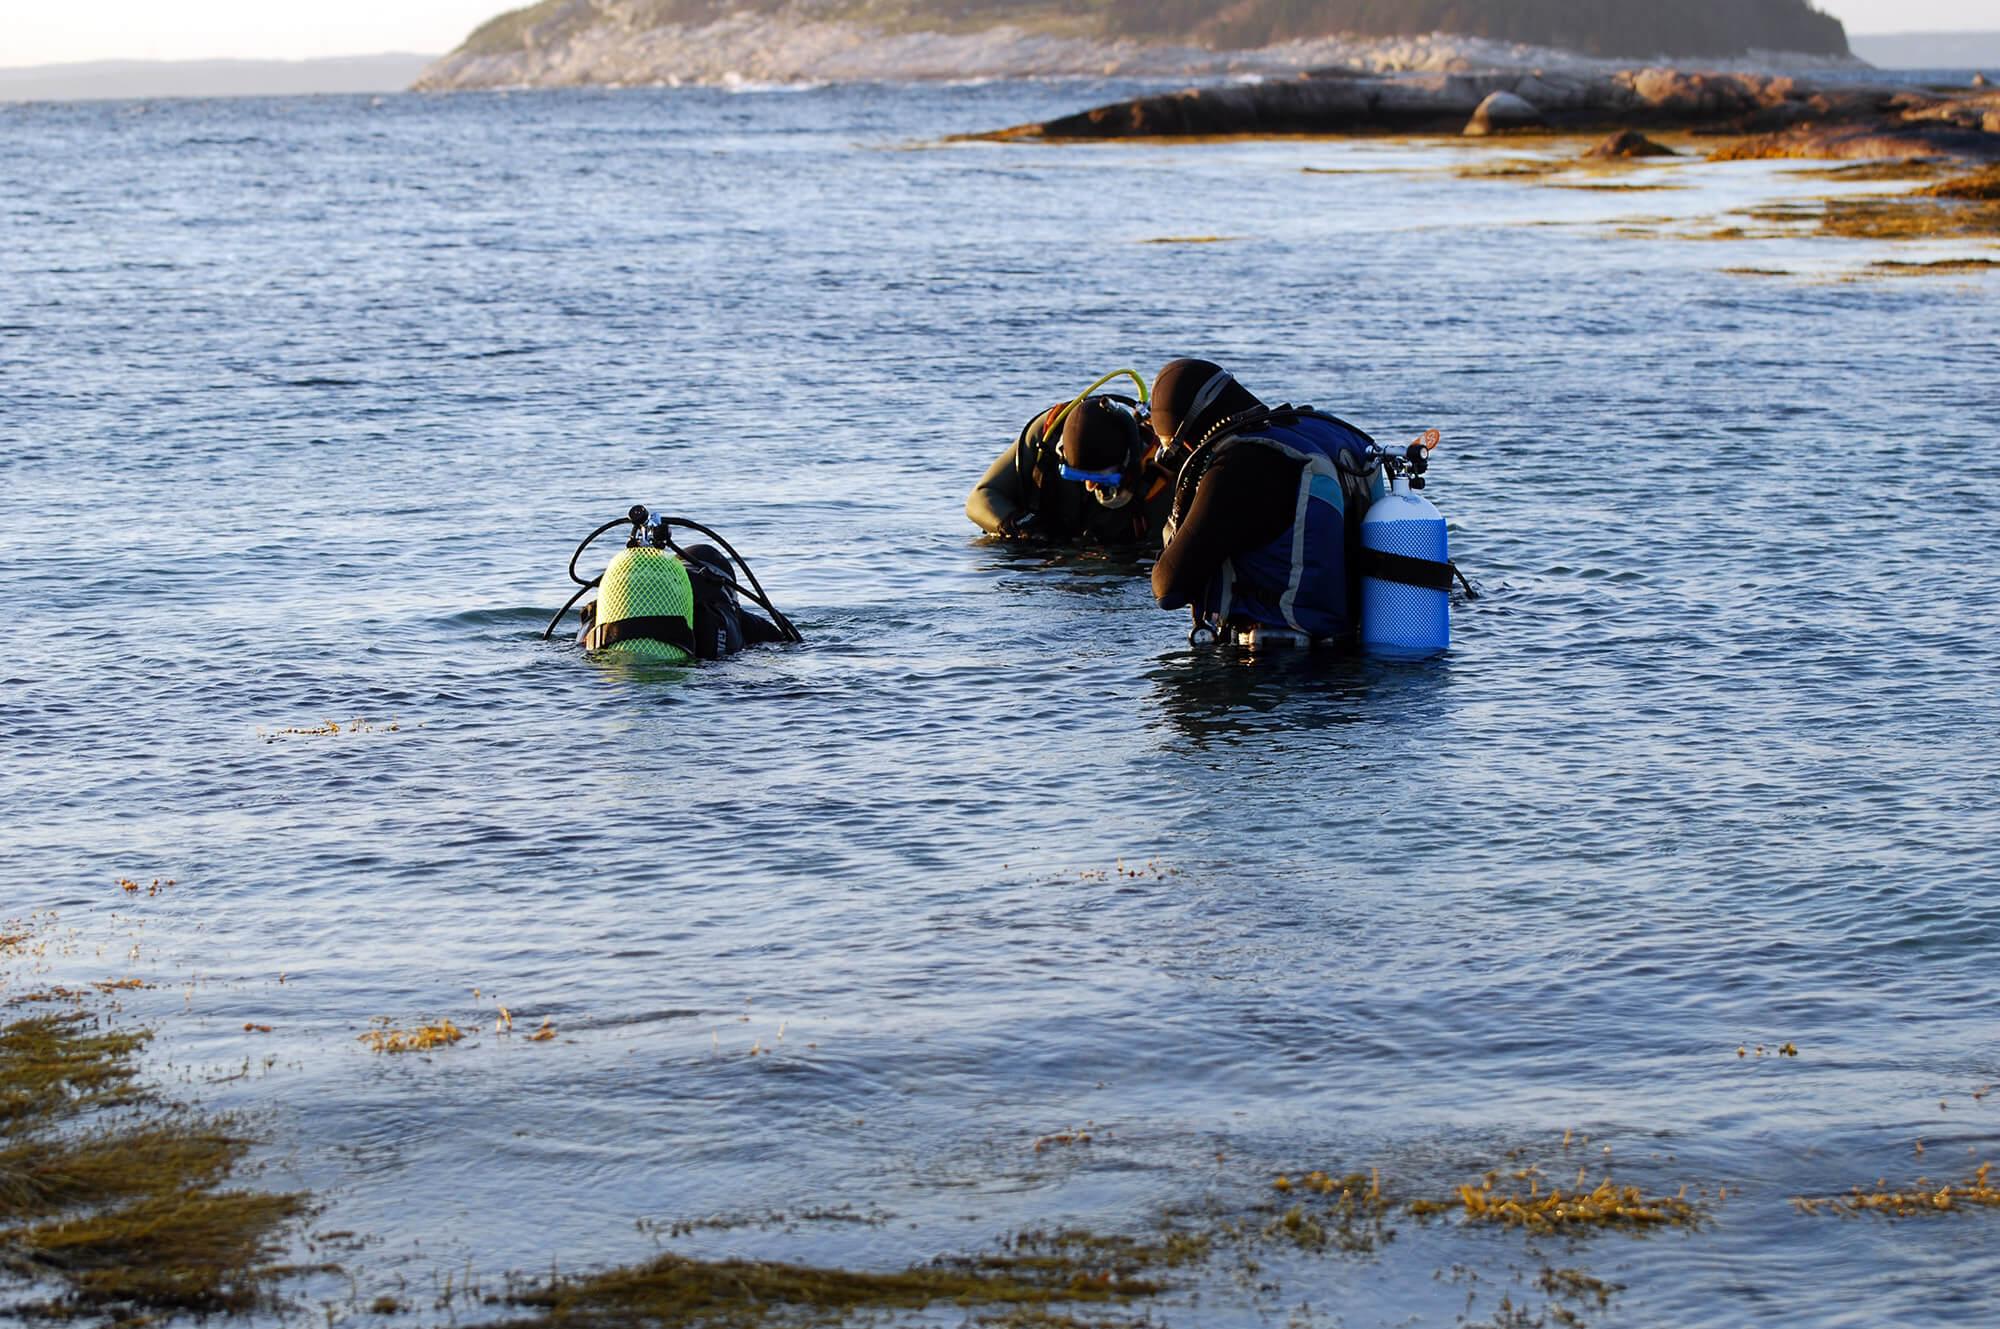 A Trio Of Scuba Divers In The Cold Water Close To Halifax, Nova Scotia In Canada